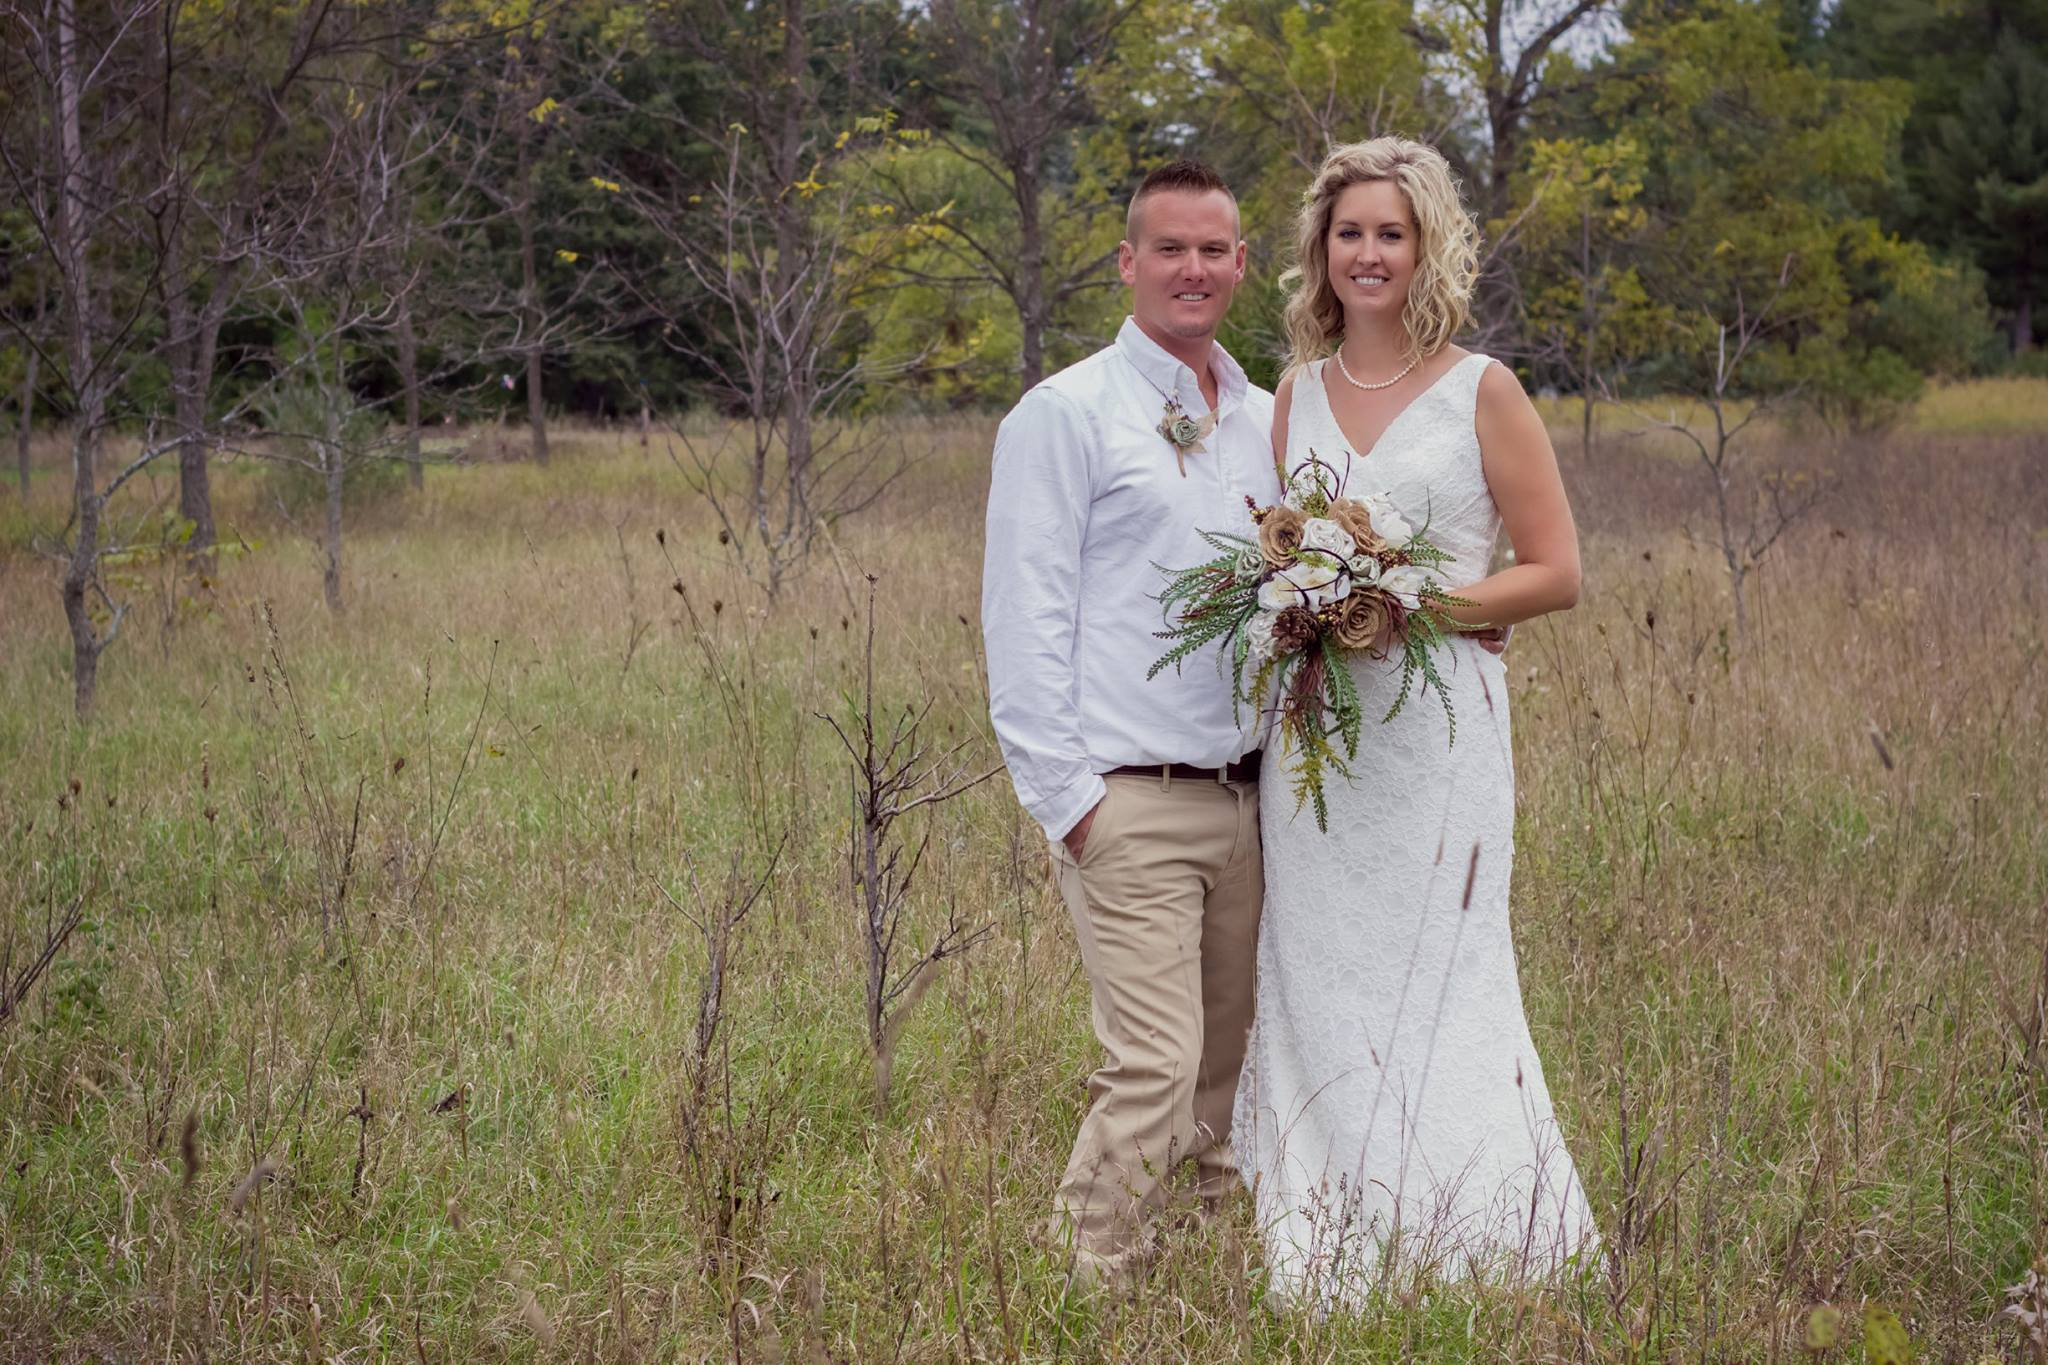 Snoeyink Wedding 10.3.2015 Coopersville, Michigan.